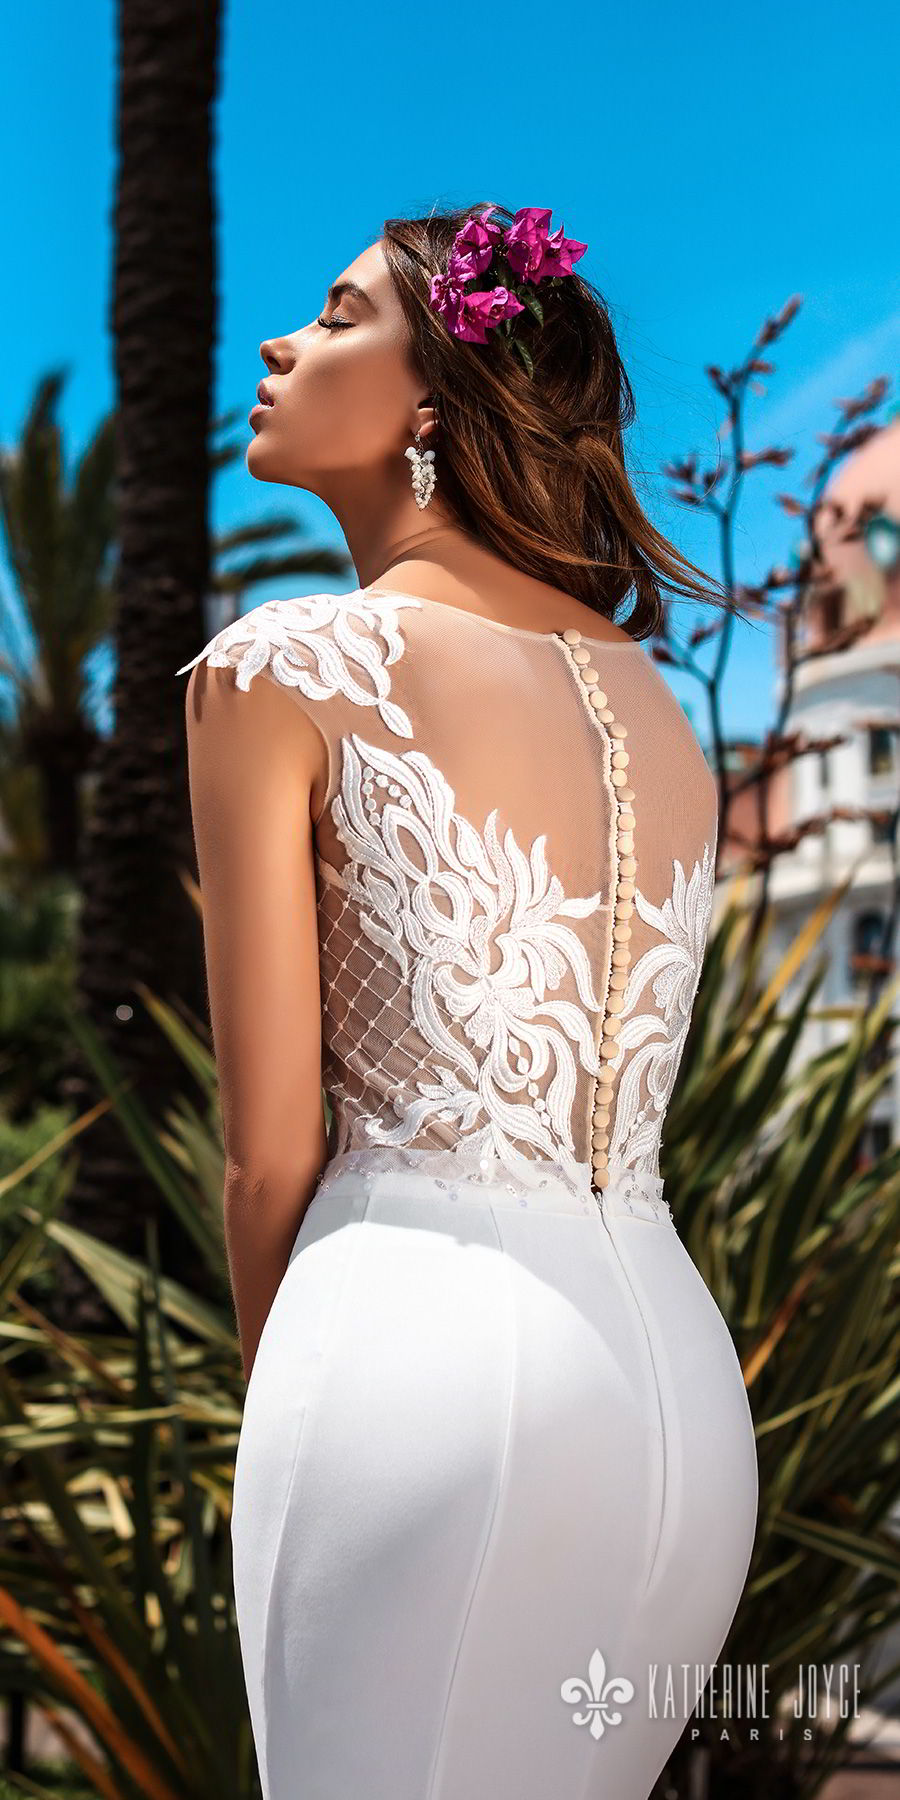 katherine joyce 2018 bridal cap sleeves illusion bateau sweetheart neckline heavily embellished bodice elegant fit and flare wedding dress sheer lace back sweep train (gracia) zbv